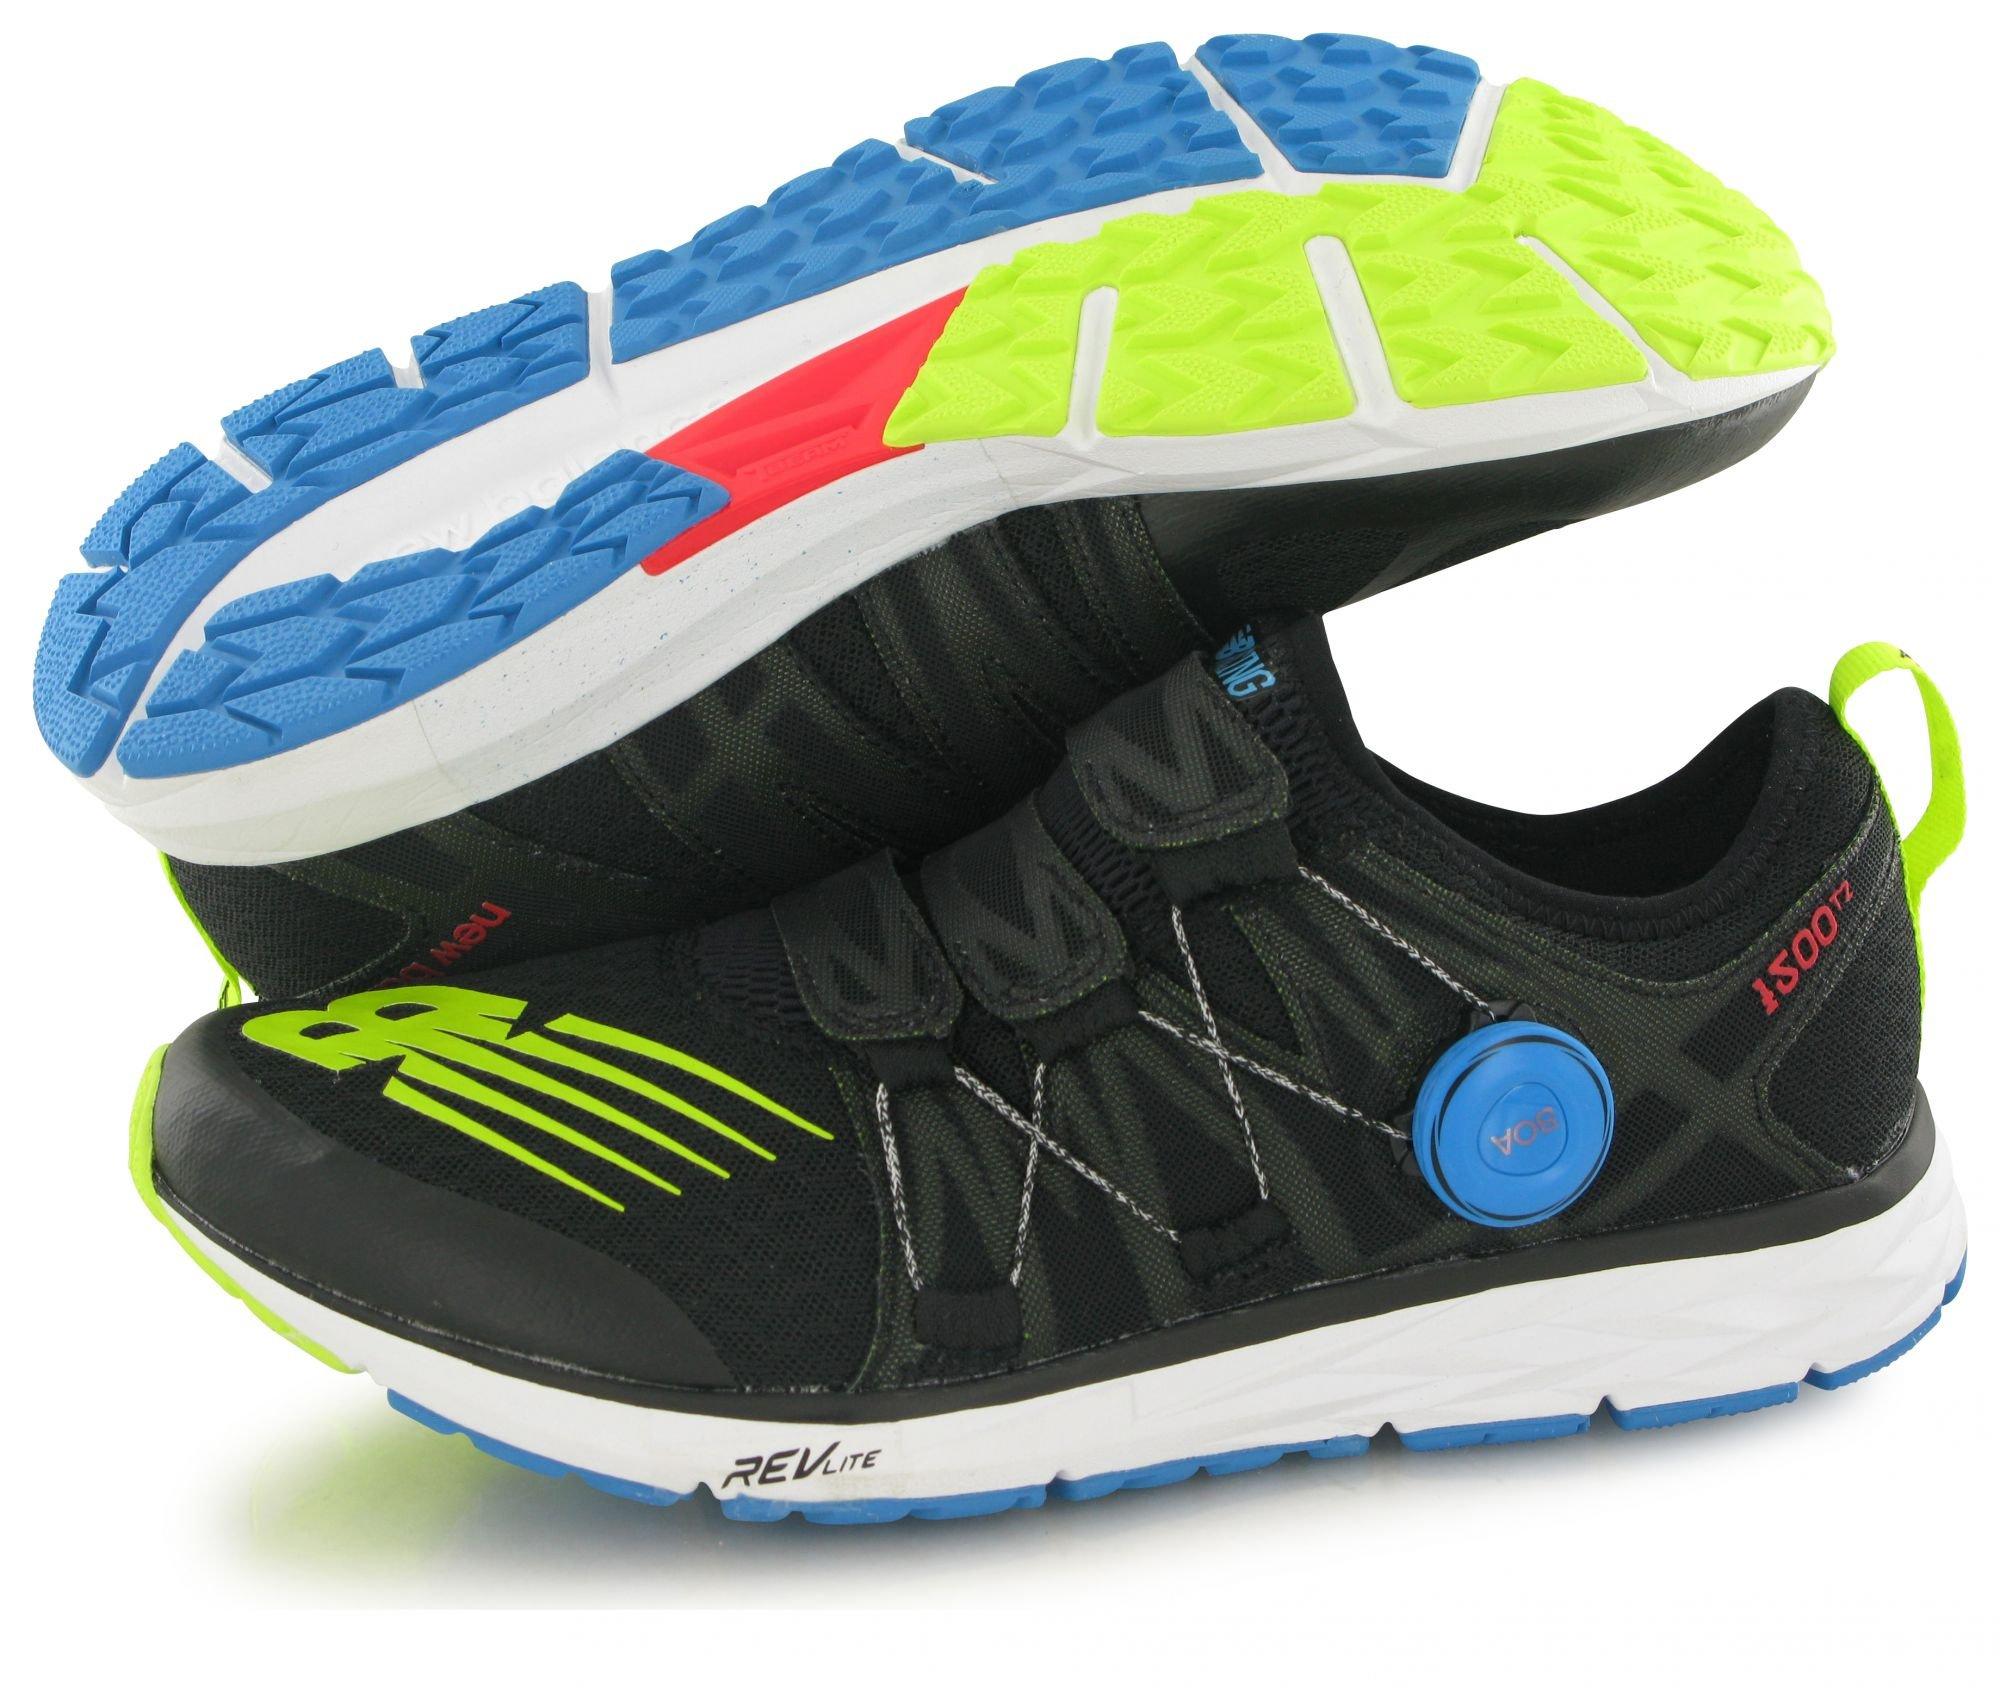 81P8 ybjlXL - New Balance Men's M1500v4 Boa Closure Running Shoes